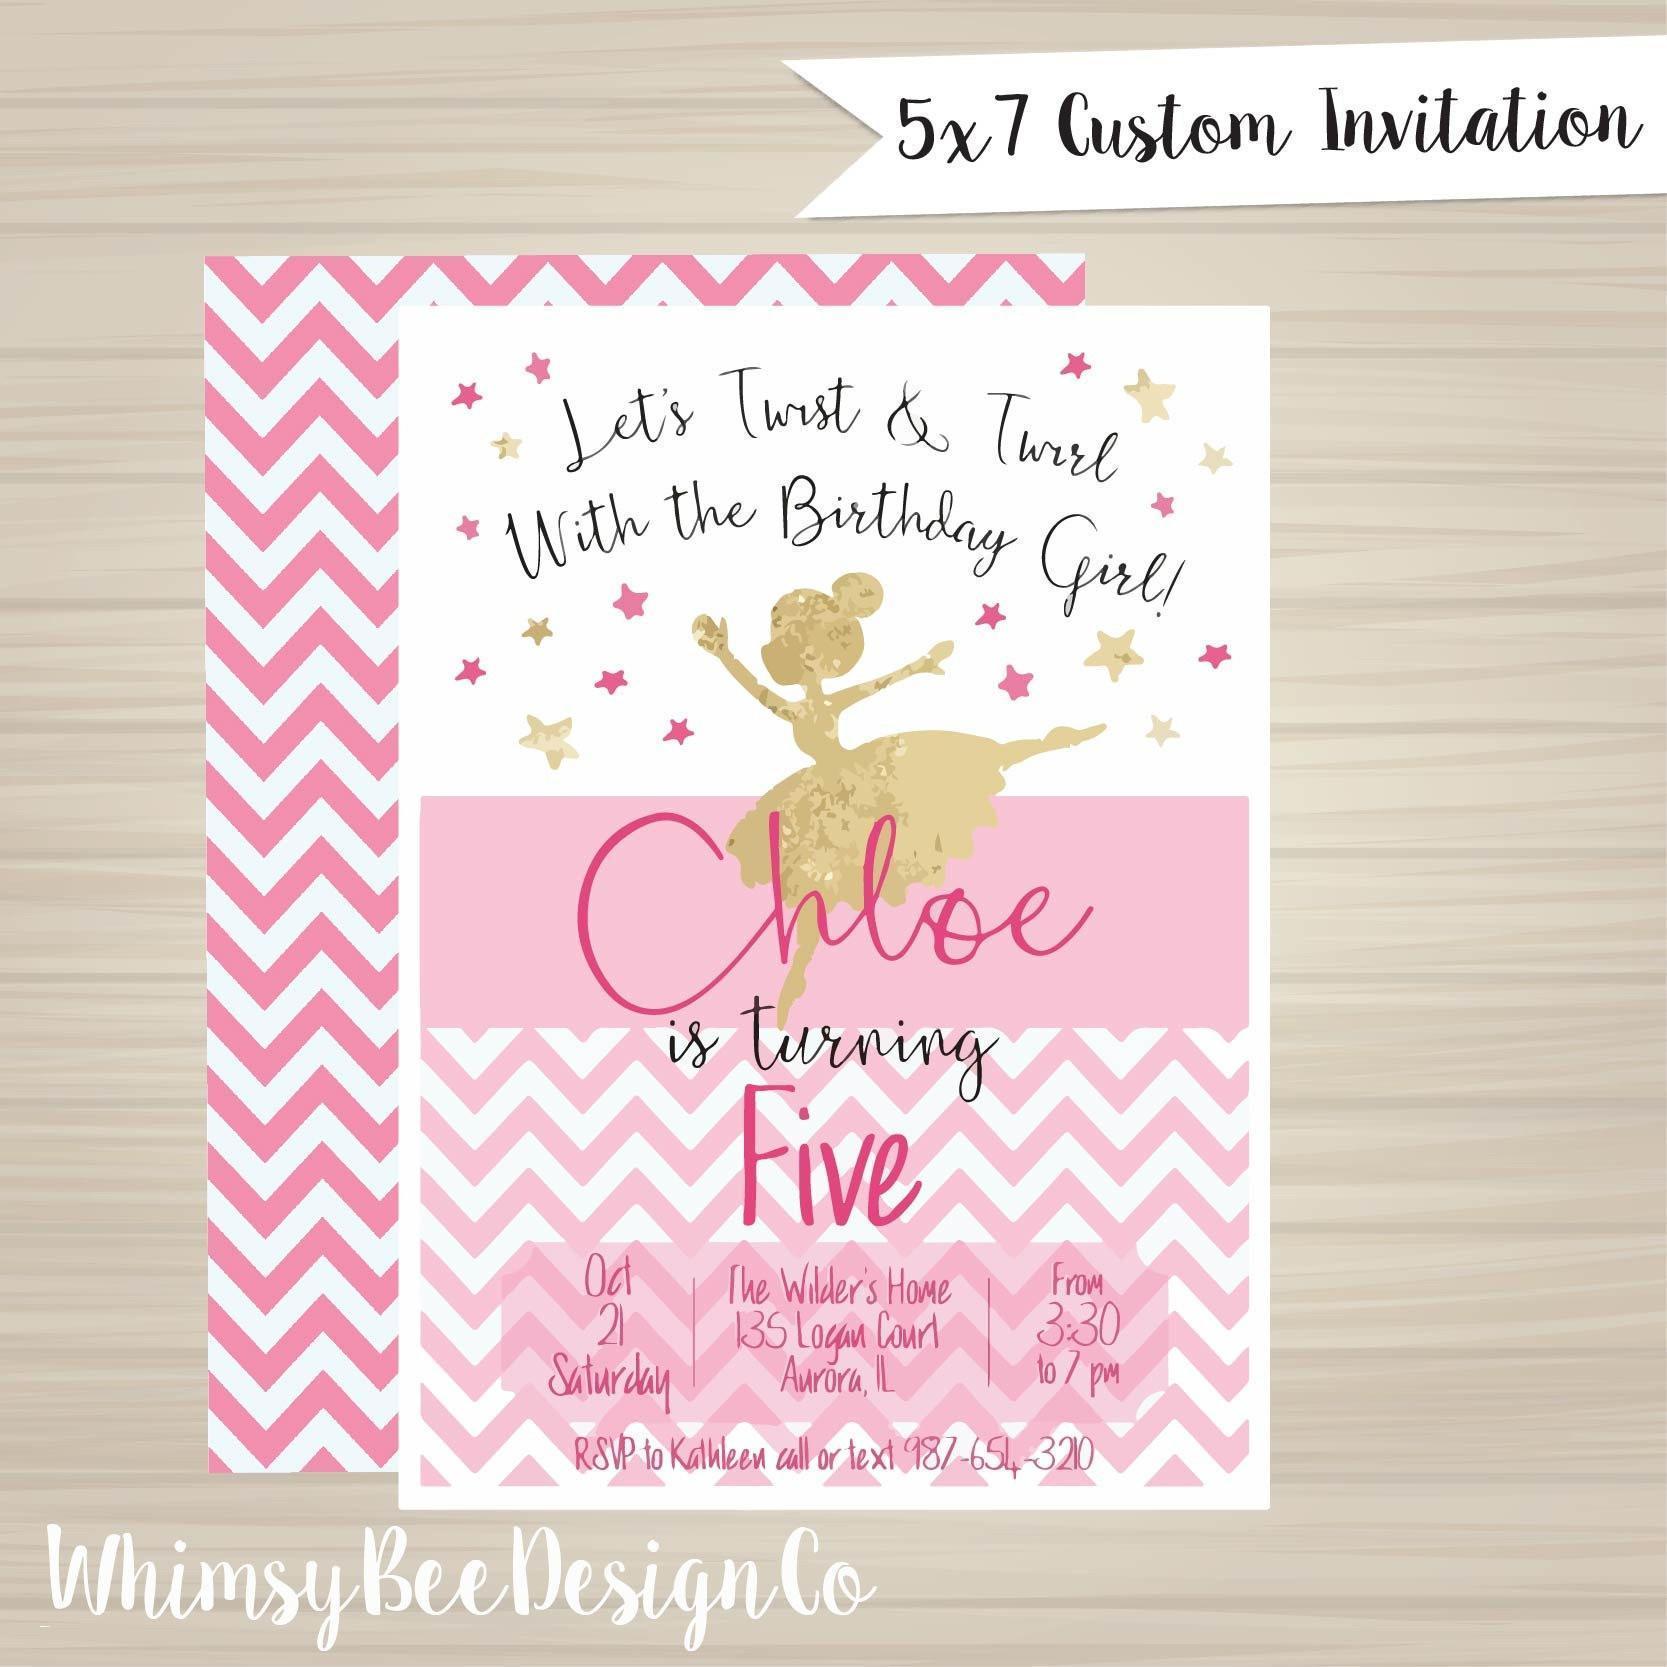 60th Birthday Invitation Format